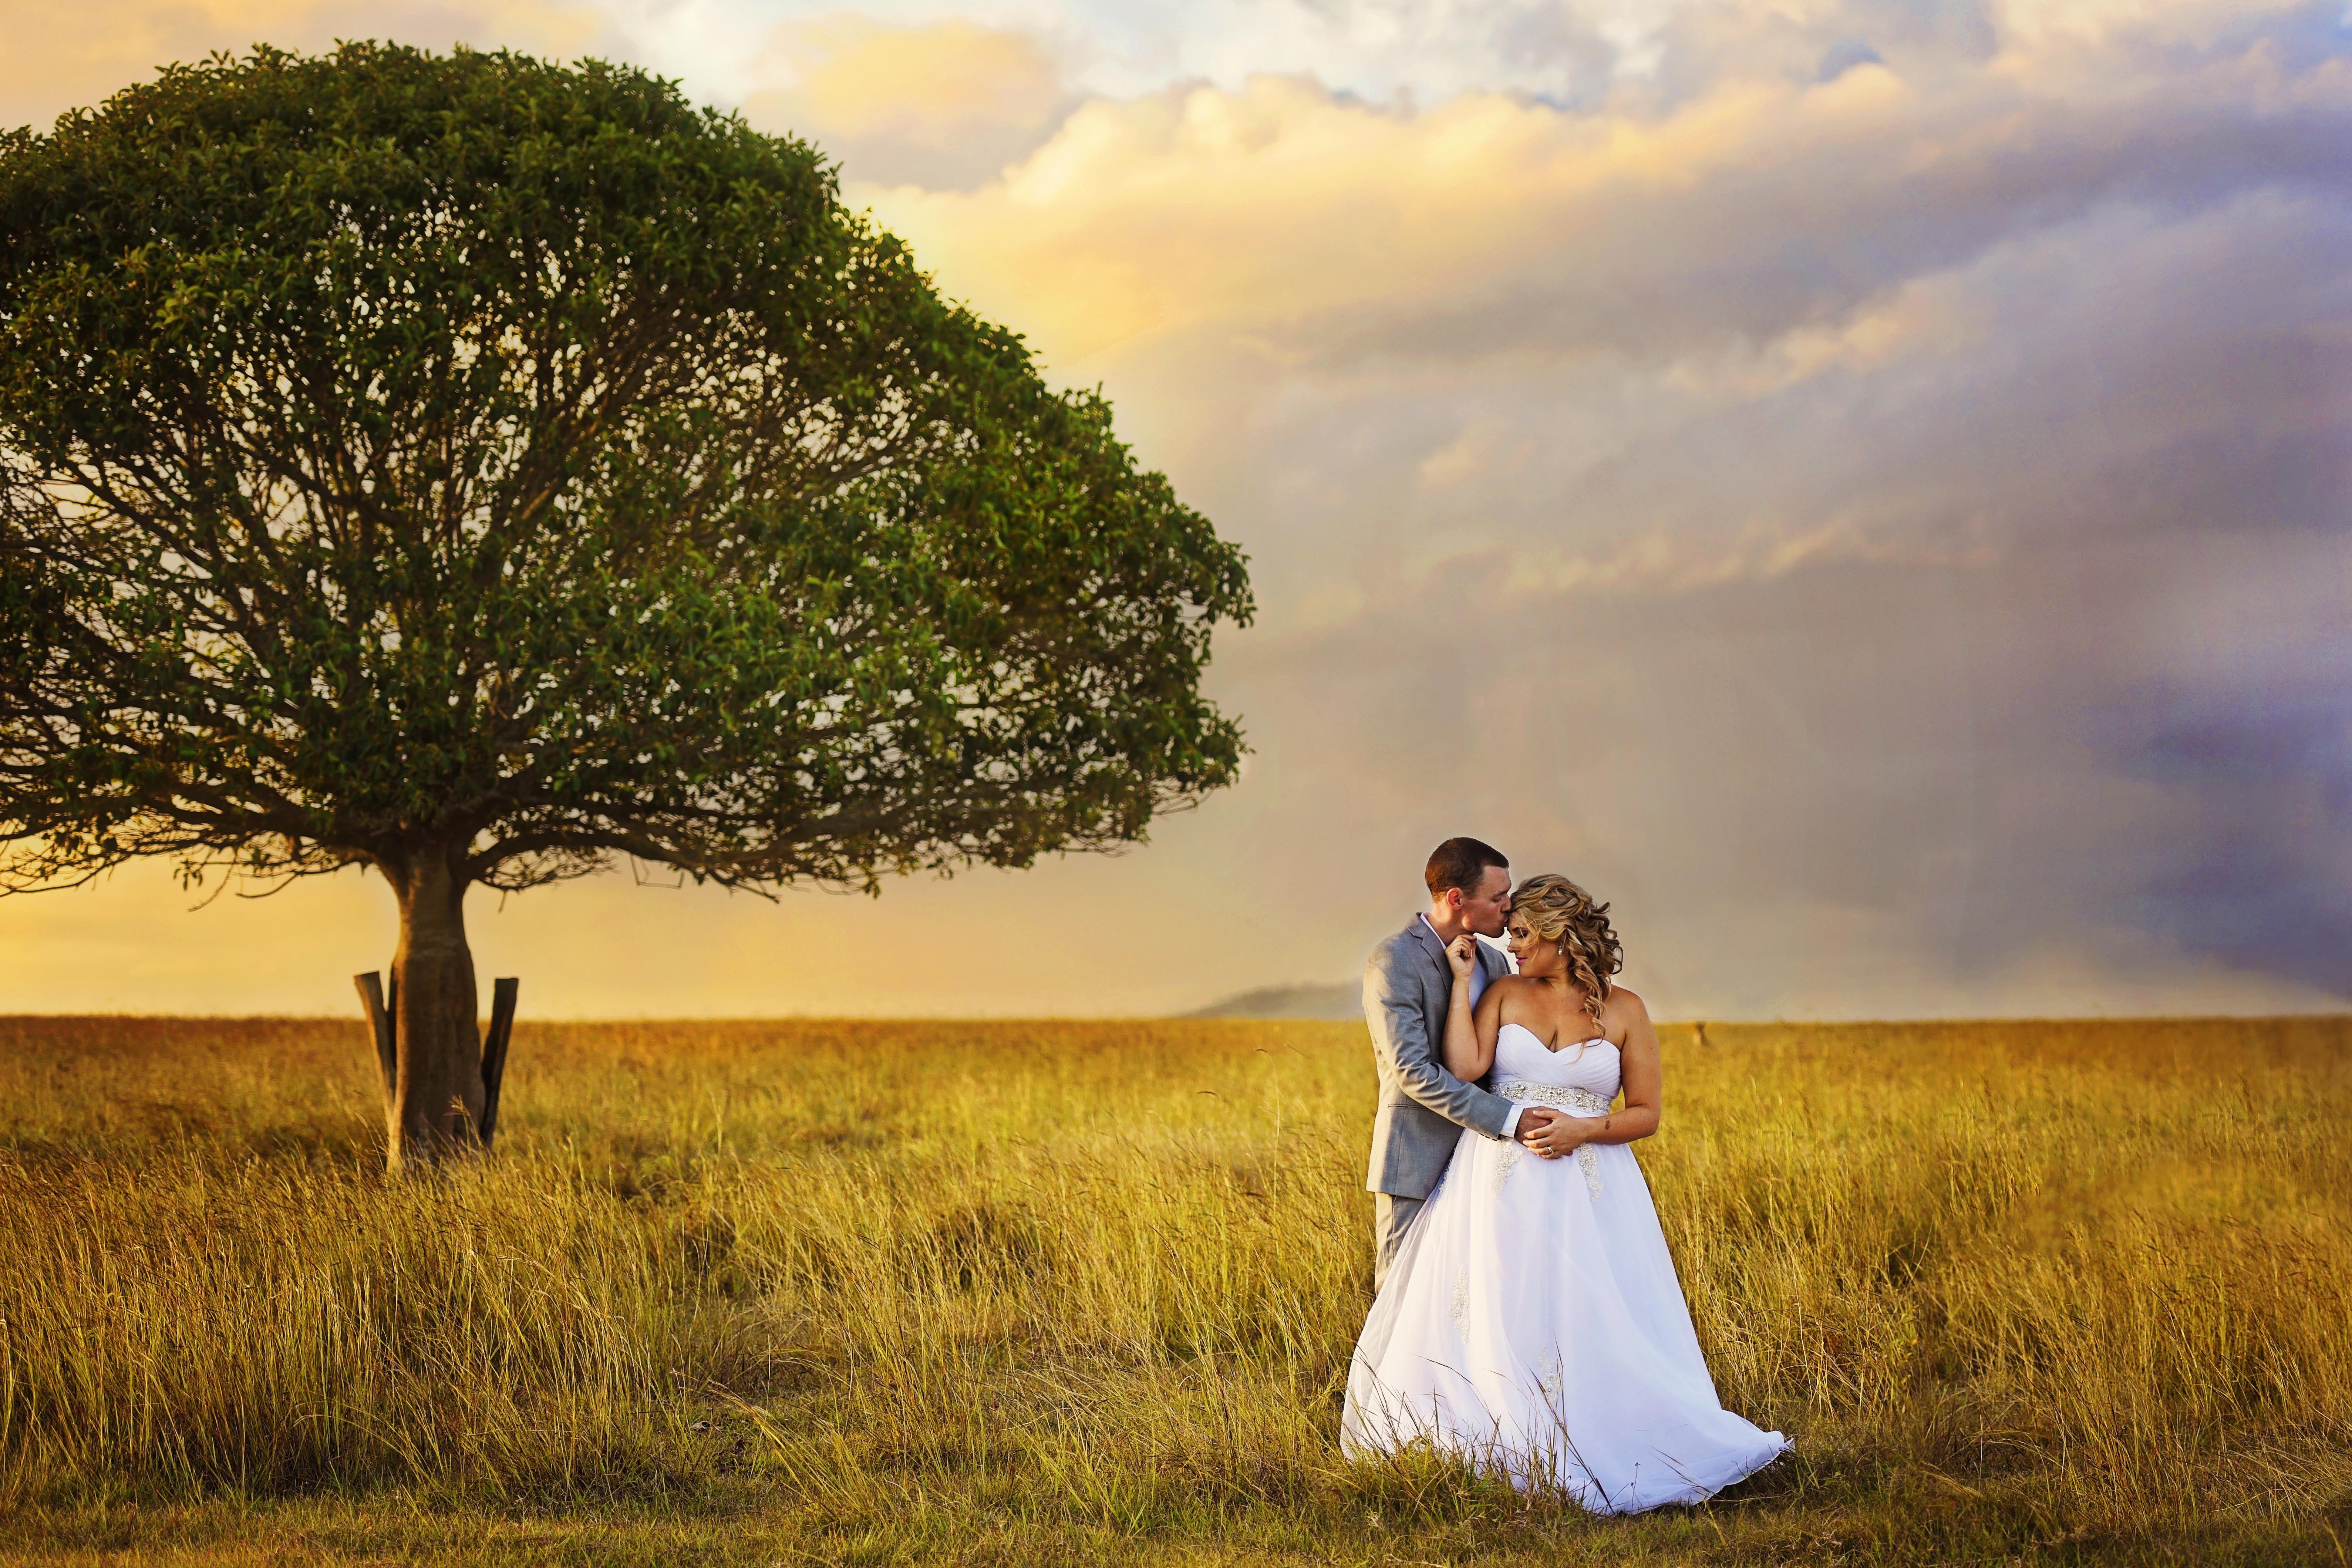 Wedding Photography. Beautiful Memories Photography. Rockhampton, Central Queensland Photographer. Photoshoot inspiration. Wedding photo ideas. Wedding photography pose